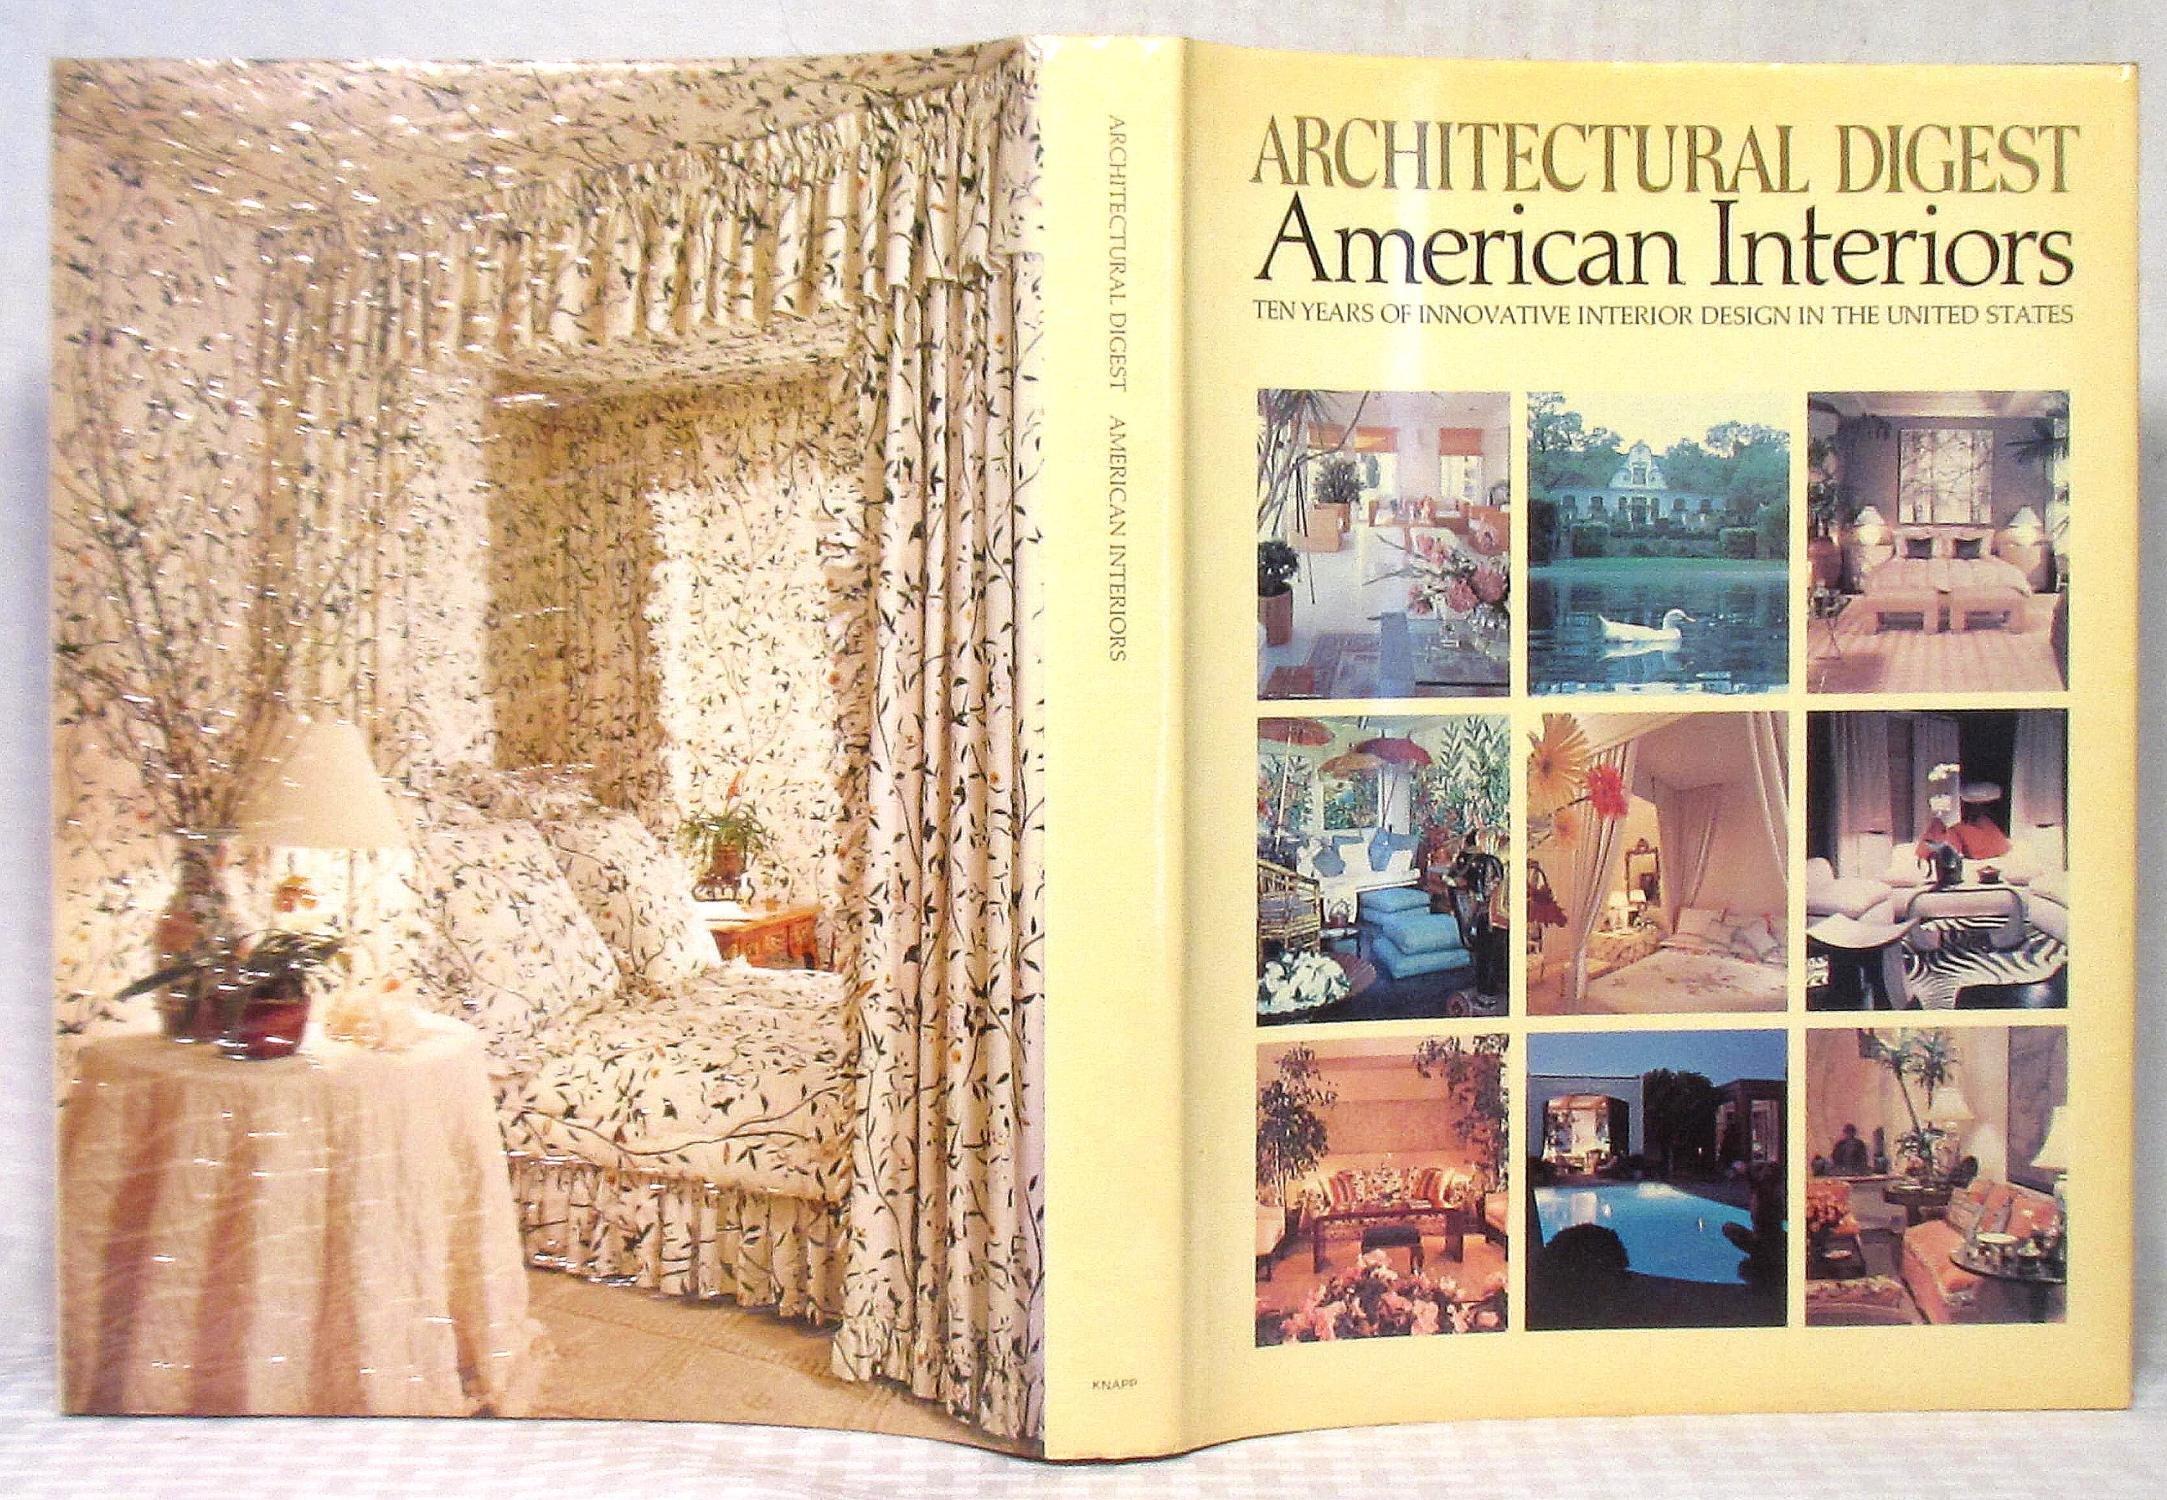 Architectural Digest American Interiors: Paige Rense: Amazon.com: Books